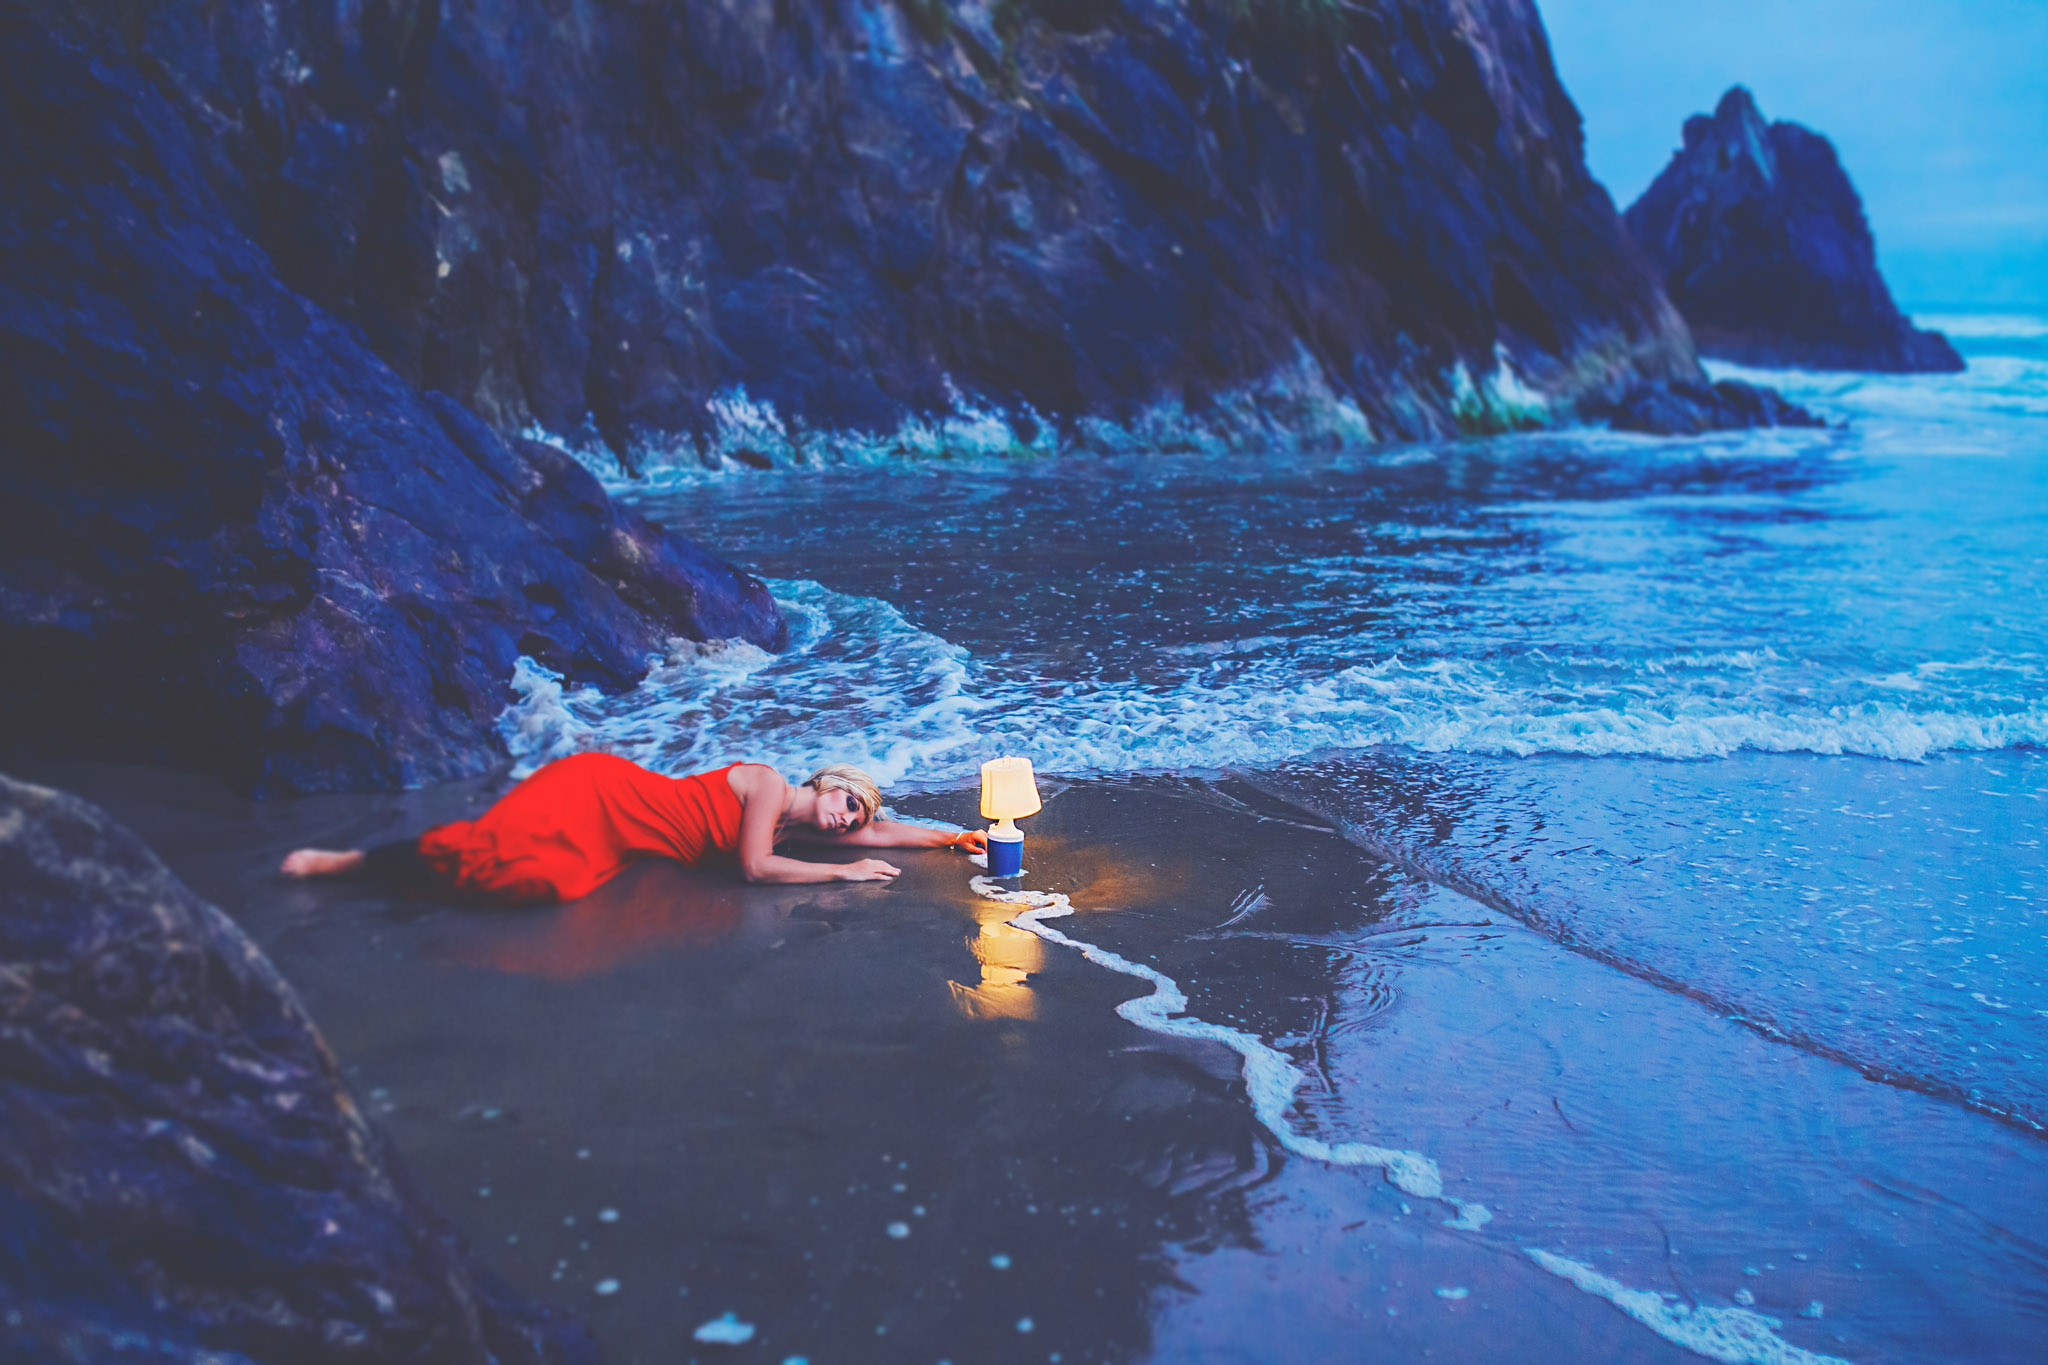 red dress project, oregon coast, jennifer picard photography & zen thinking